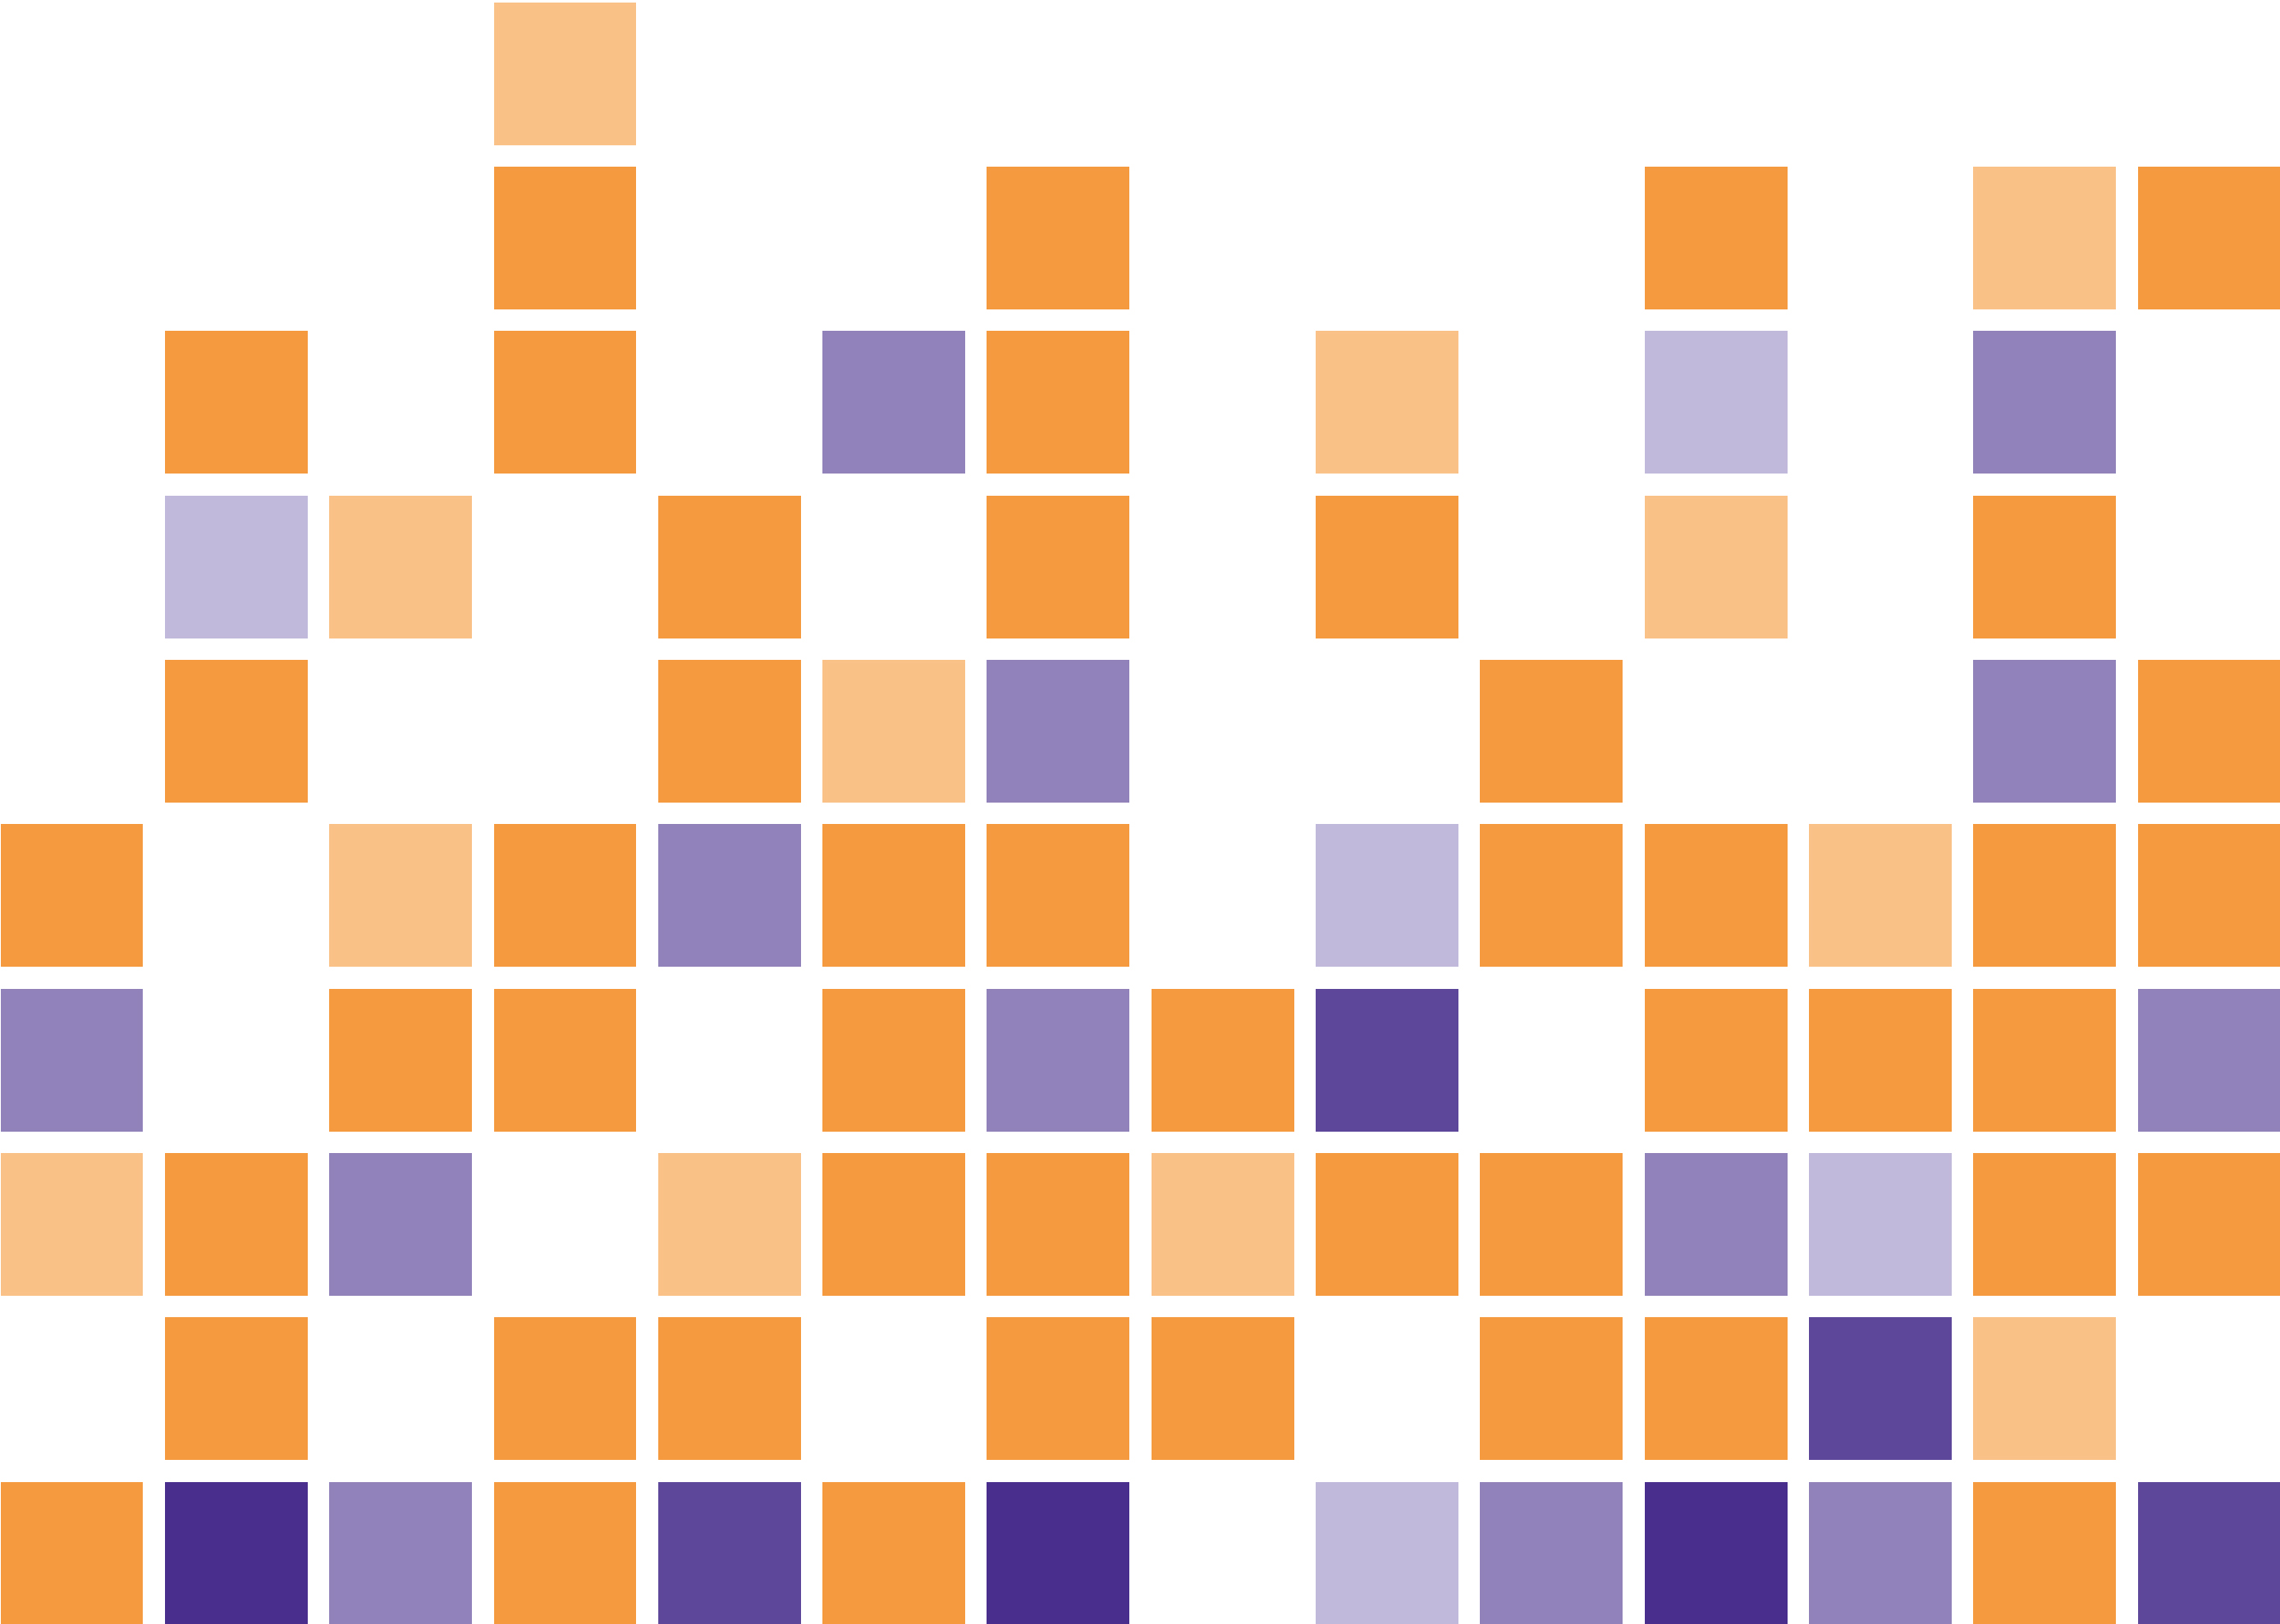 JWF mosaic pattern #3